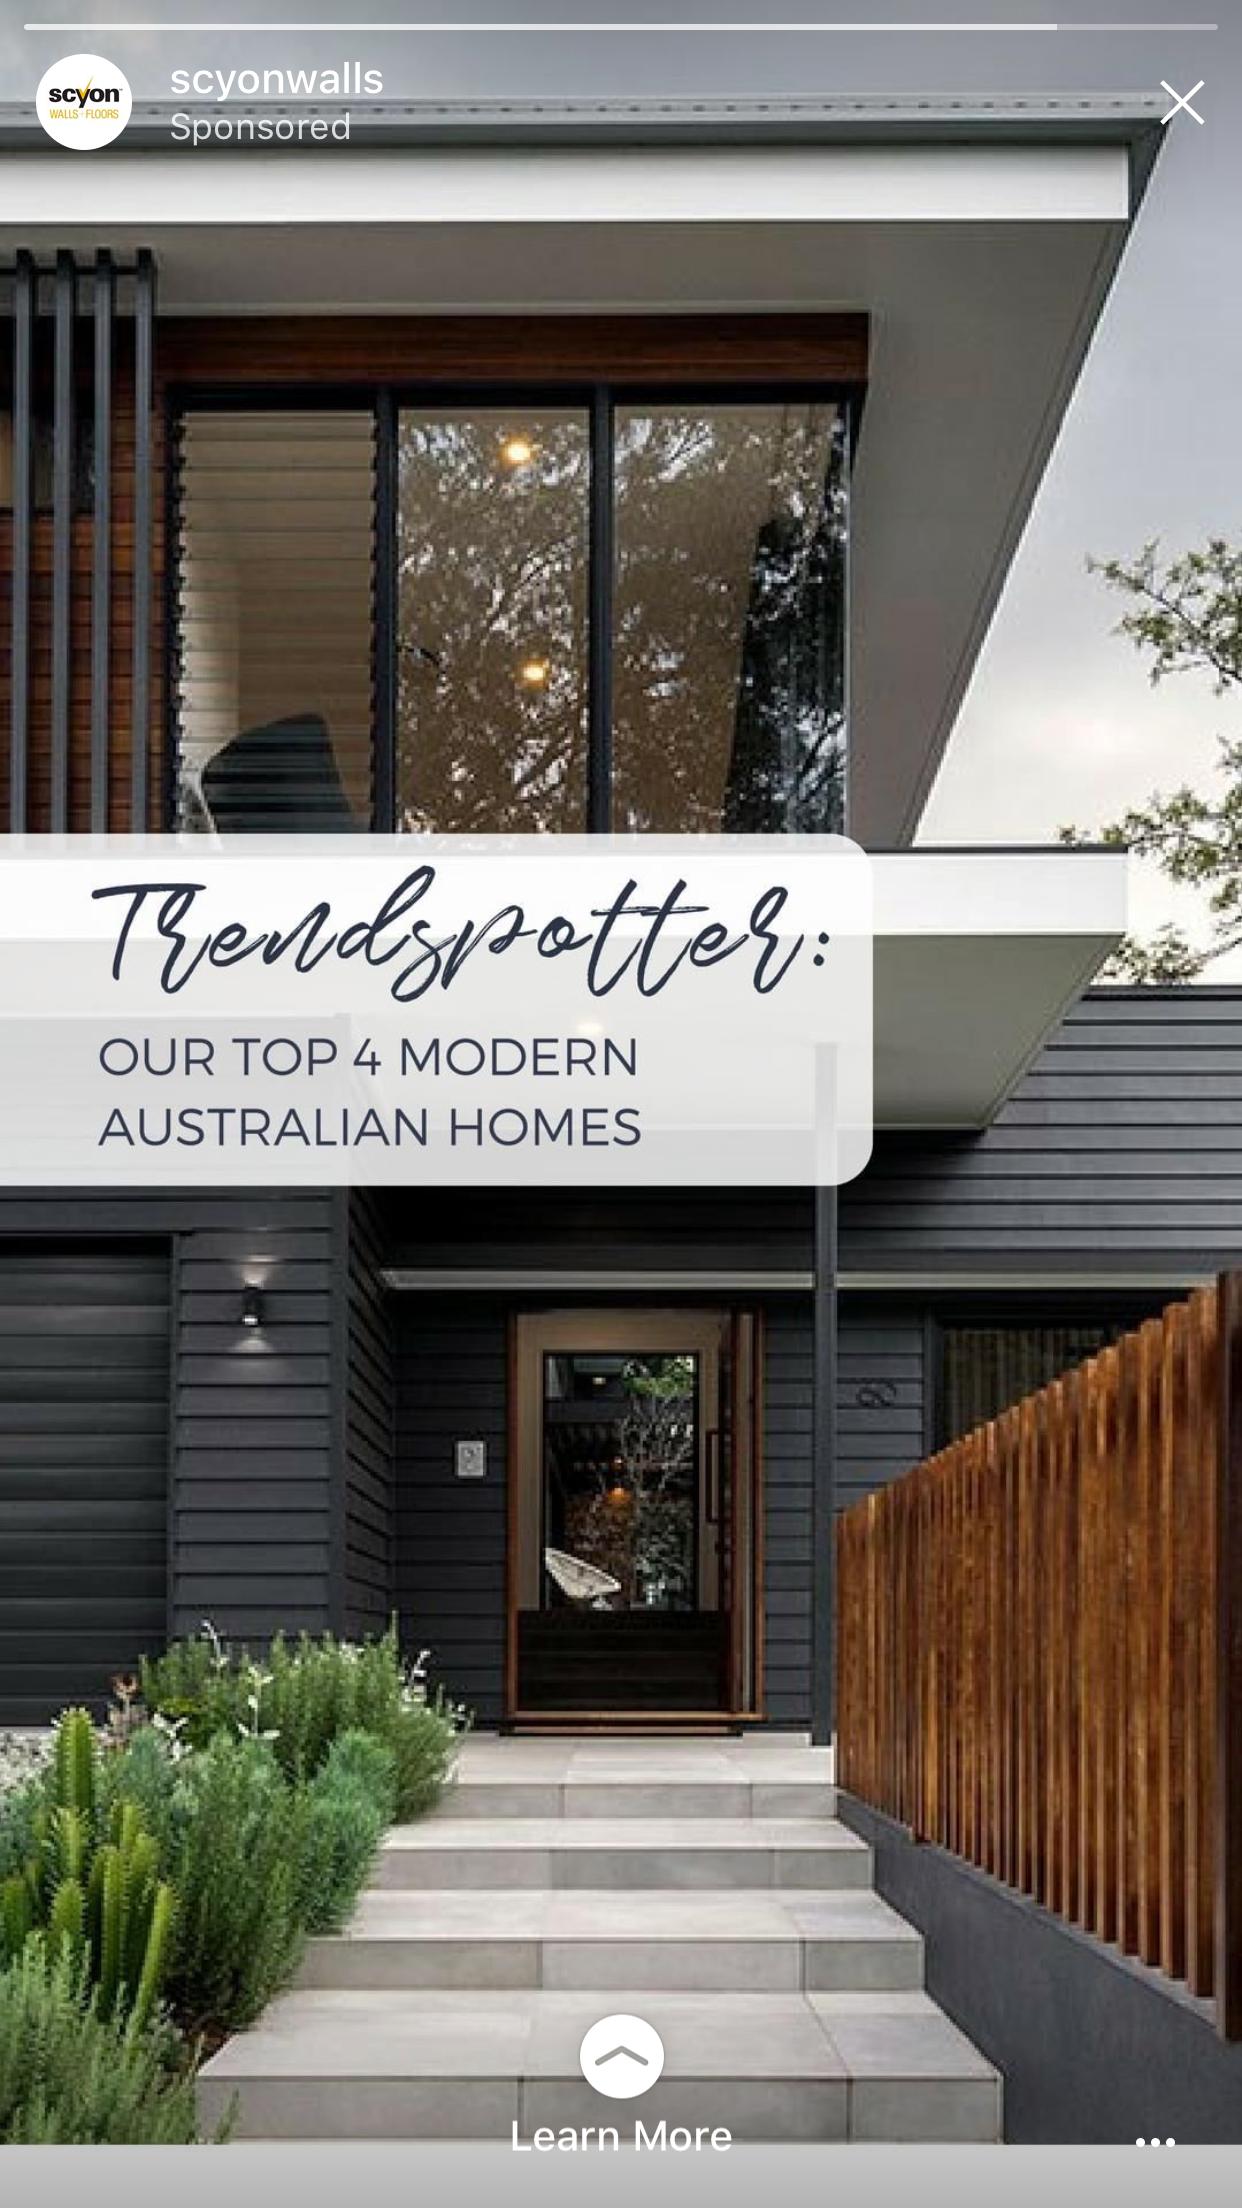 Front Elevation Balcony Designs: Pin By พลอยไพลิน เสาวรส On บ้าน In 2019